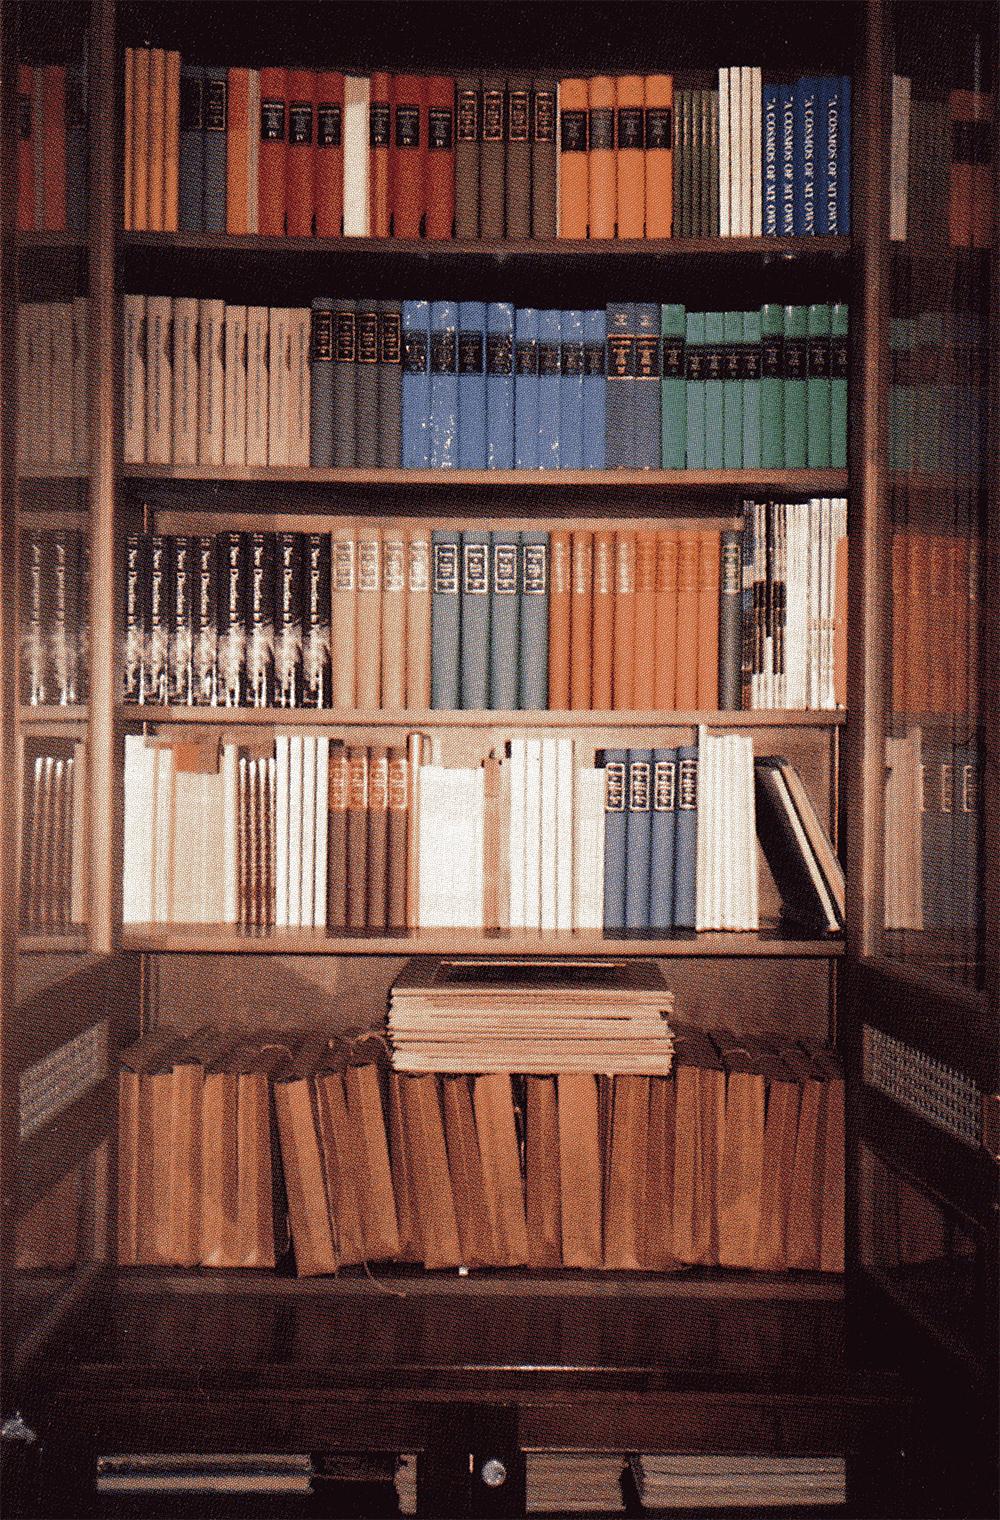 sagamore-1989-rarebookroombooks